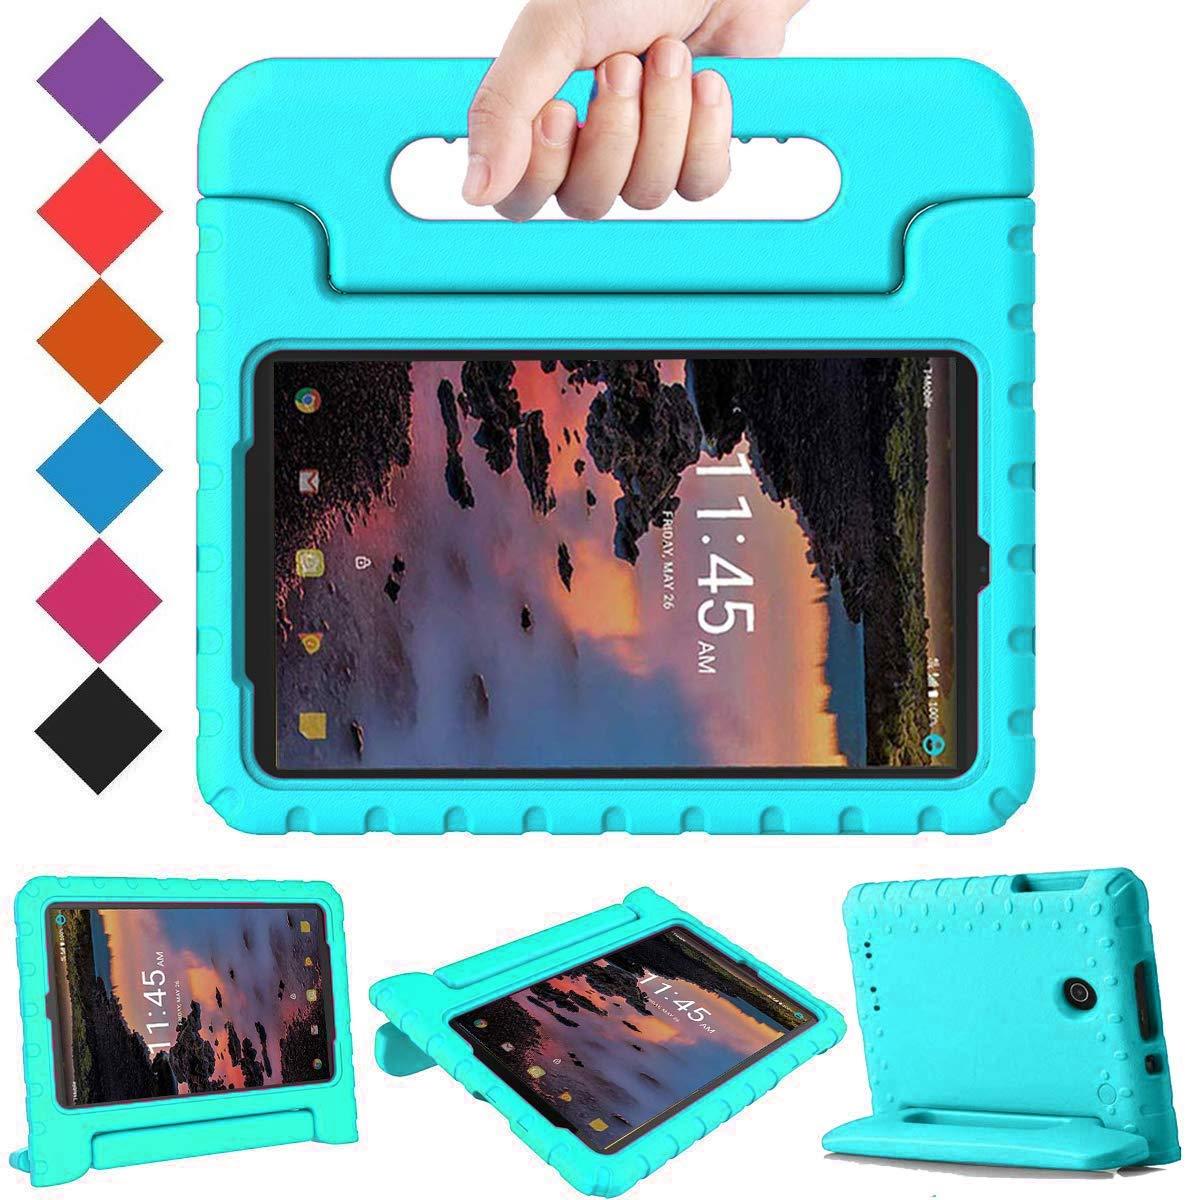 BMOUO Kids Case for Alcatel Joy Tab 8 2019/T-Mobile 3T 8 Tablet 2018/A30 Tablet 8 2017, Lightweight Kid-Proof Handle Stand Case for Alcatel Joy Tab 2019/Alcatel 3T 8 2018 / A30 8 inch 2017 - Turquoise